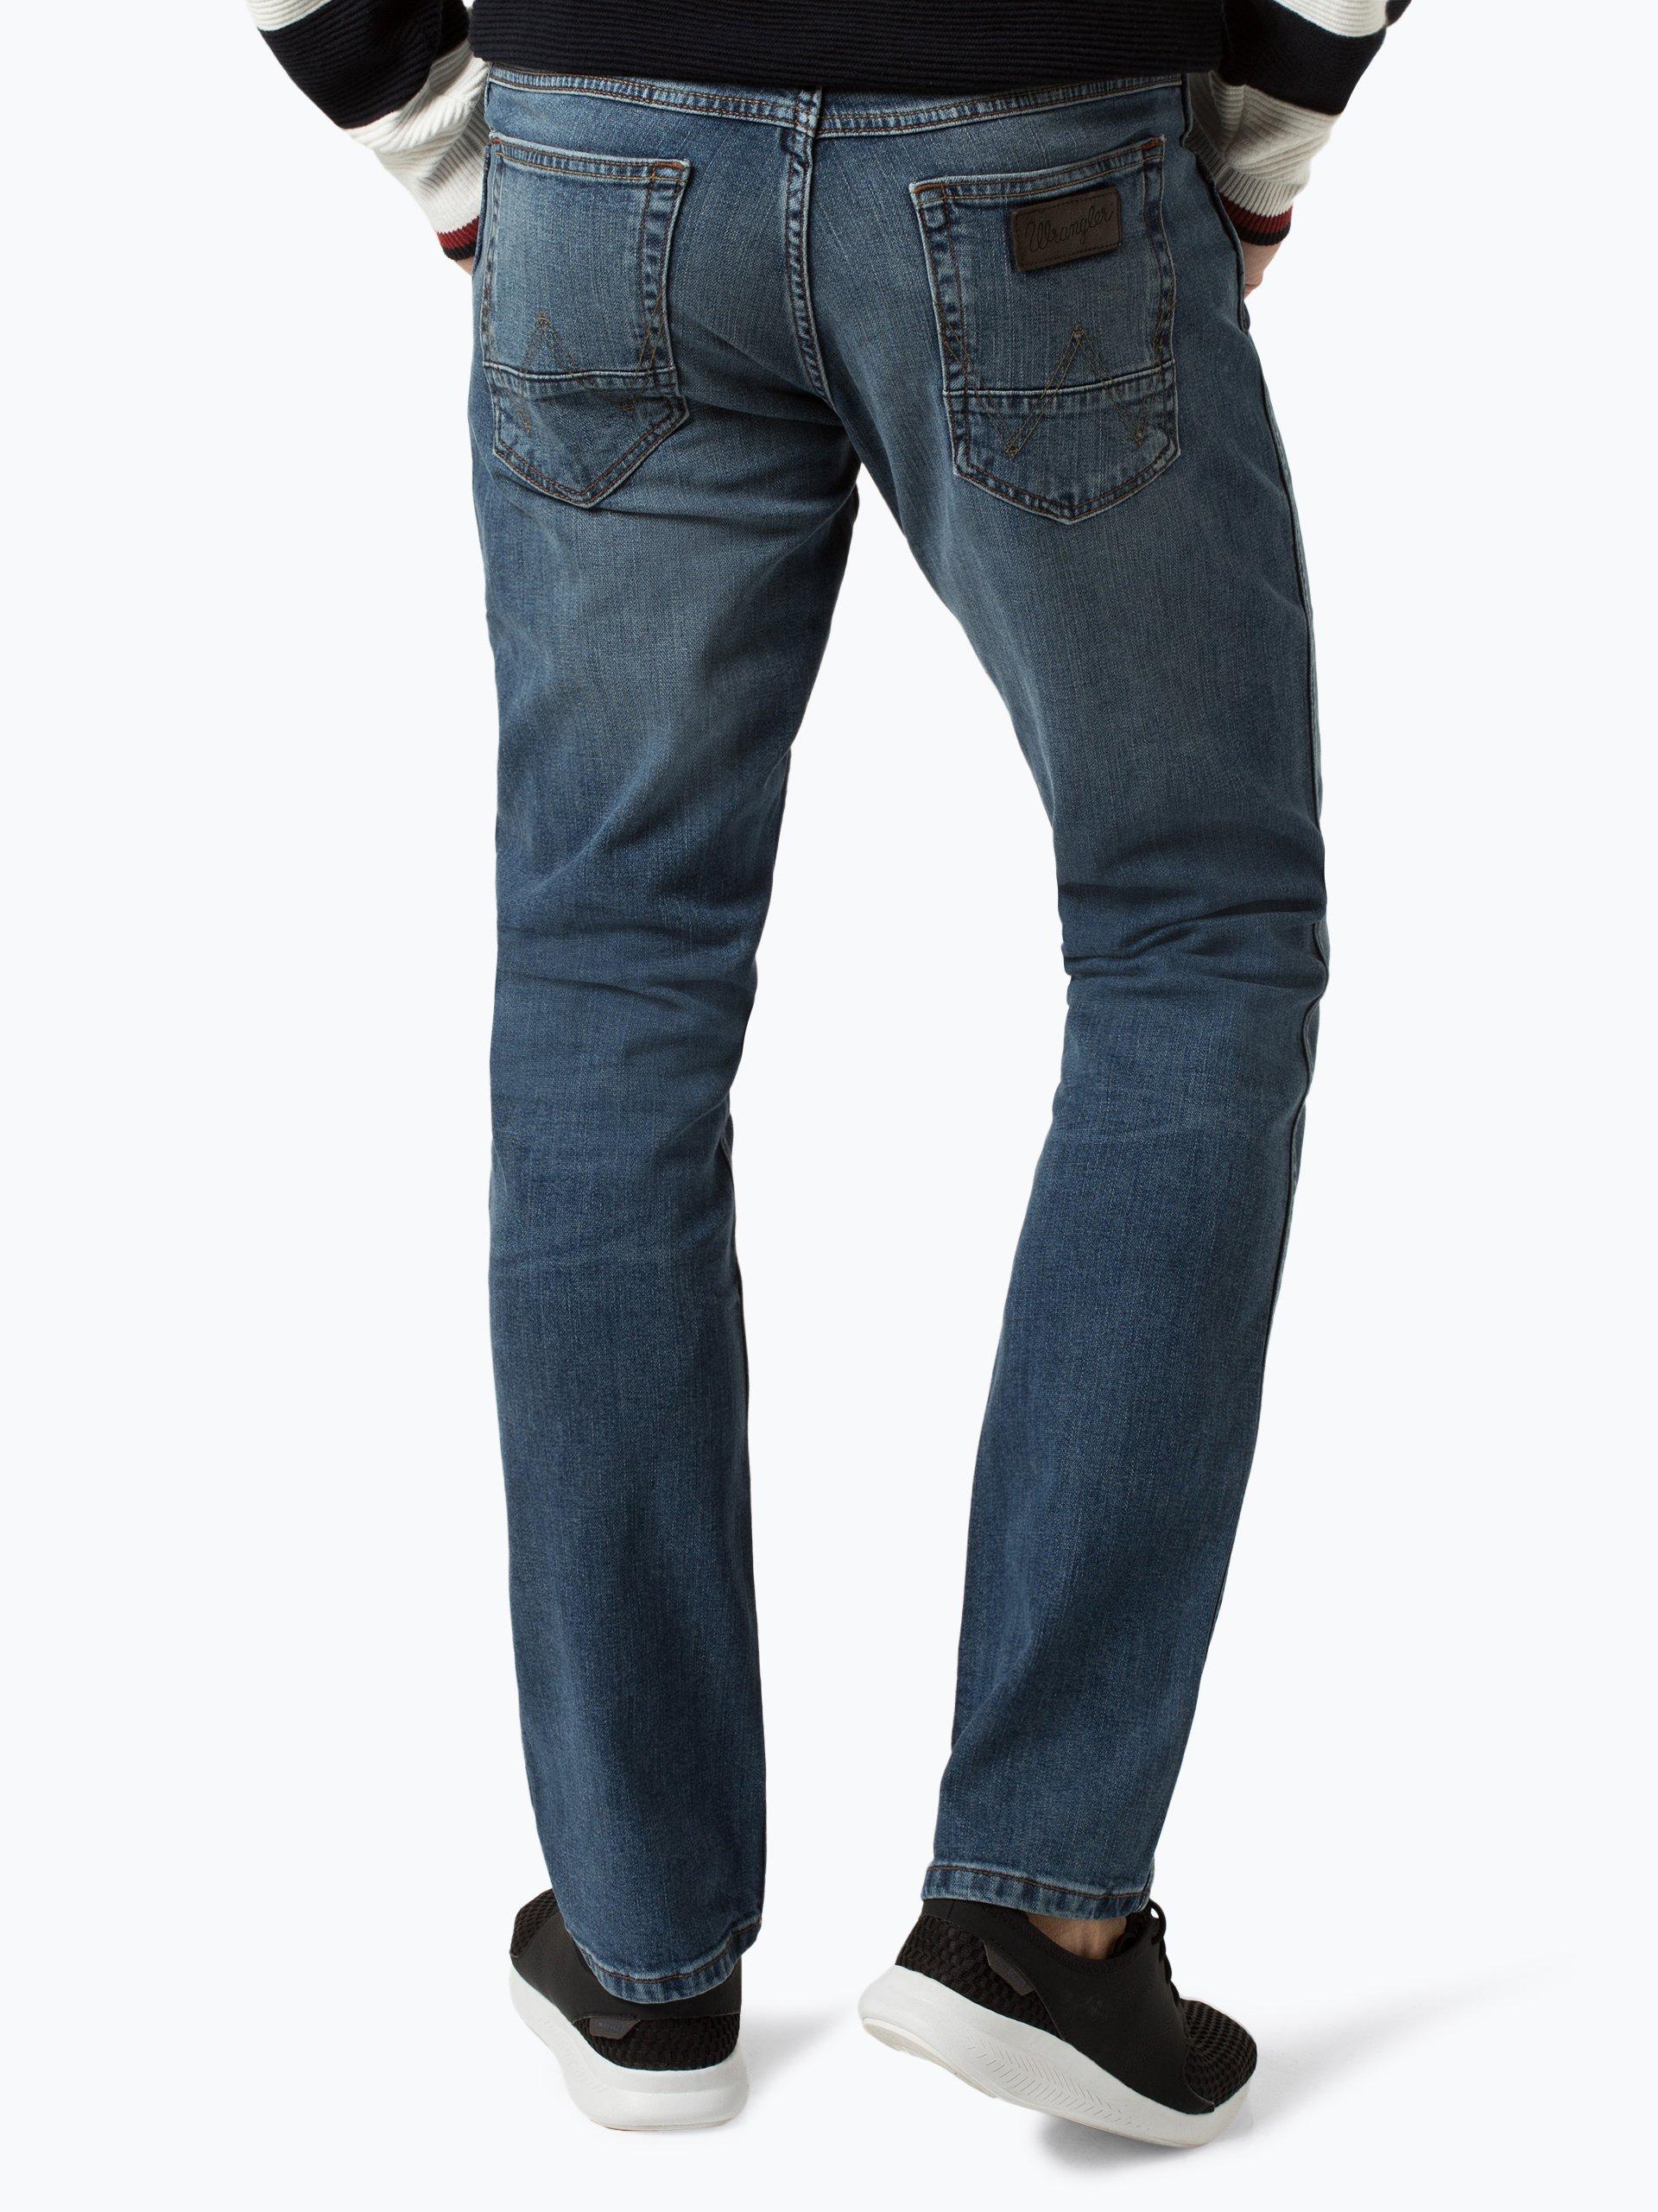 Wrangler Herren Jeans - Greensboro